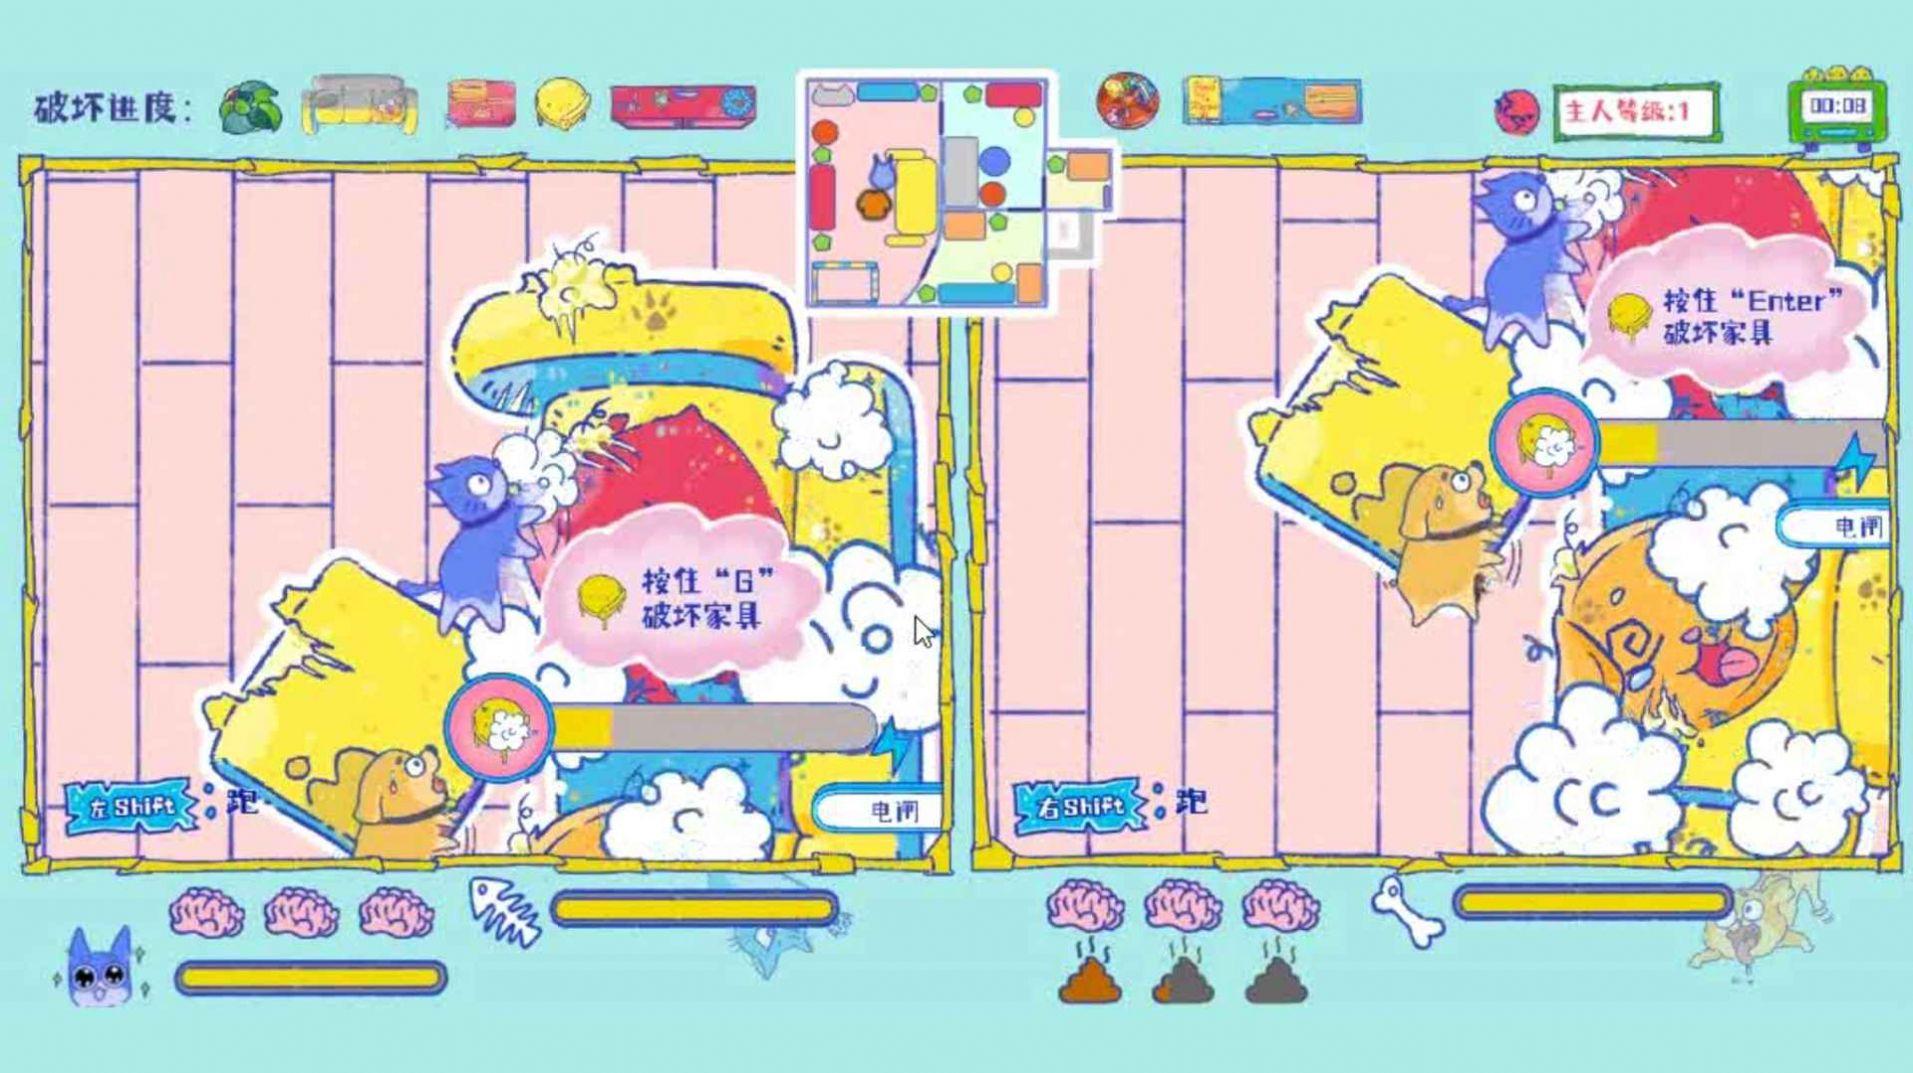 Messy Up模组游戏最新安卓版图片2